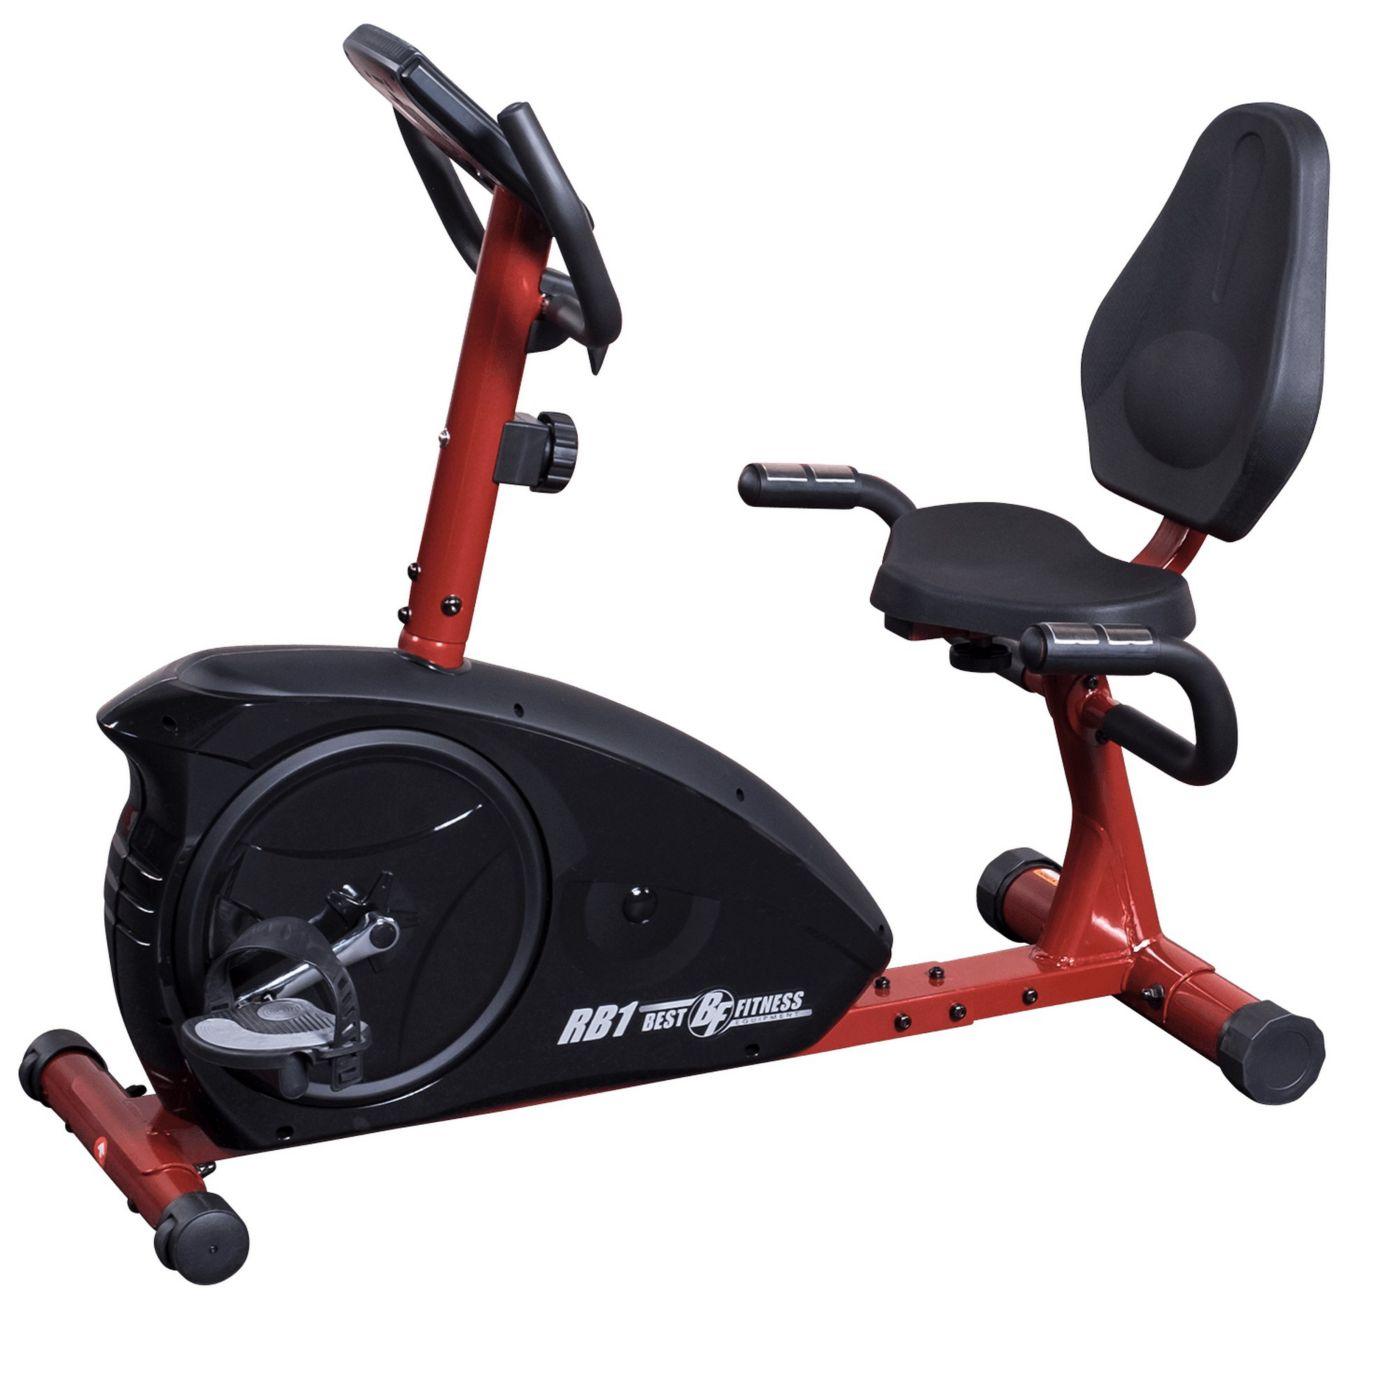 Best Fitness BFRB1 Recumbent Exercise Bike